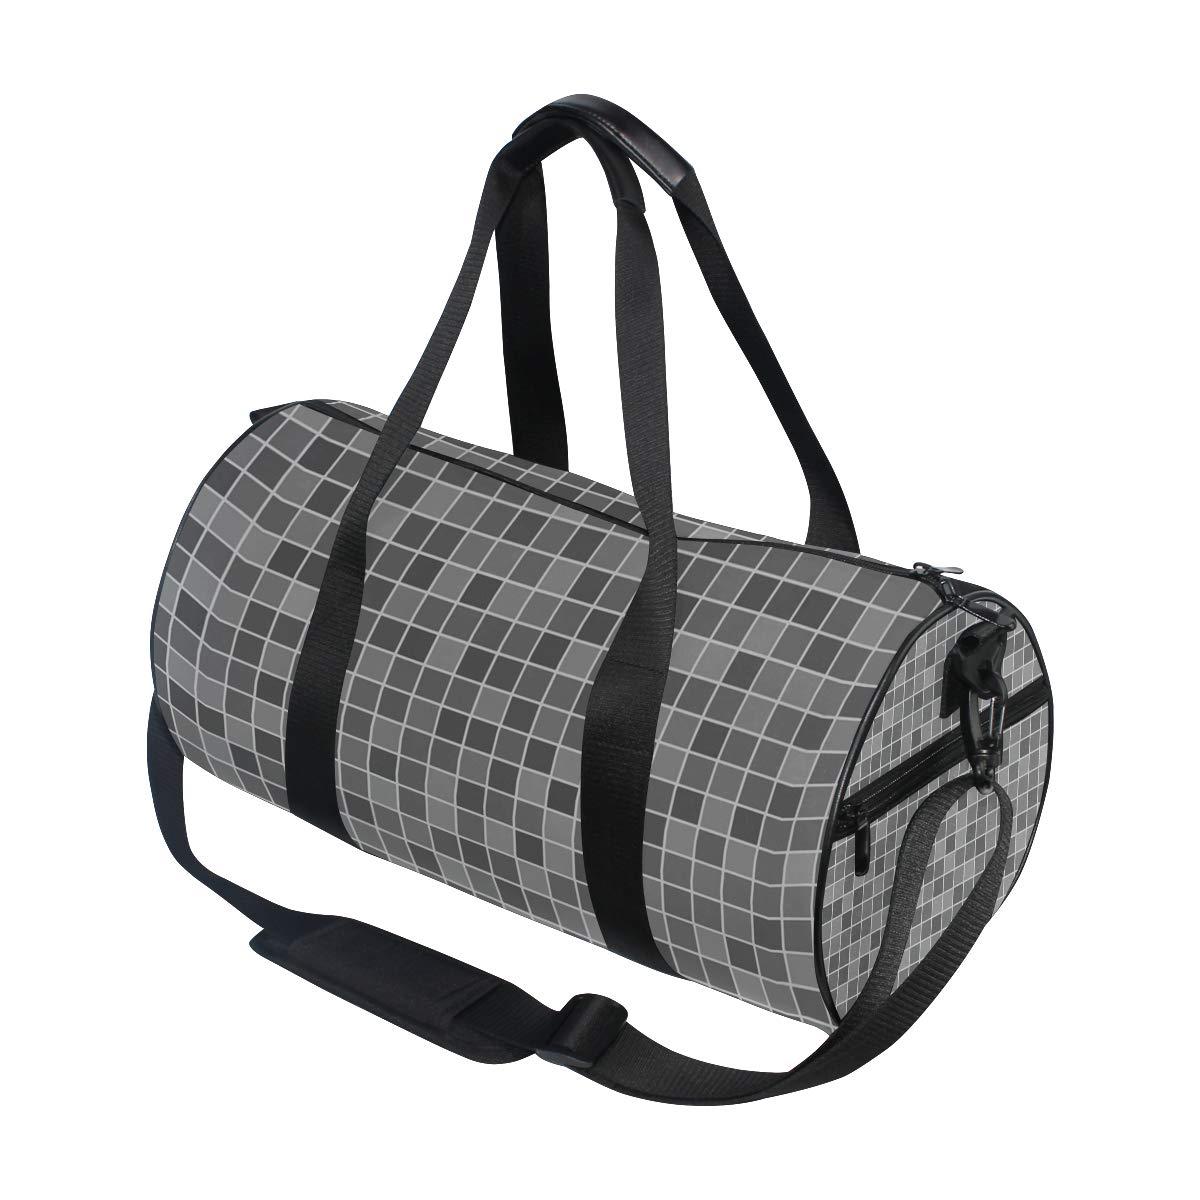 Gray Plaid Ceramic PictureWaterproof Non-Slip Wearable Crossbody Bag fitness bag Shoulder Bag